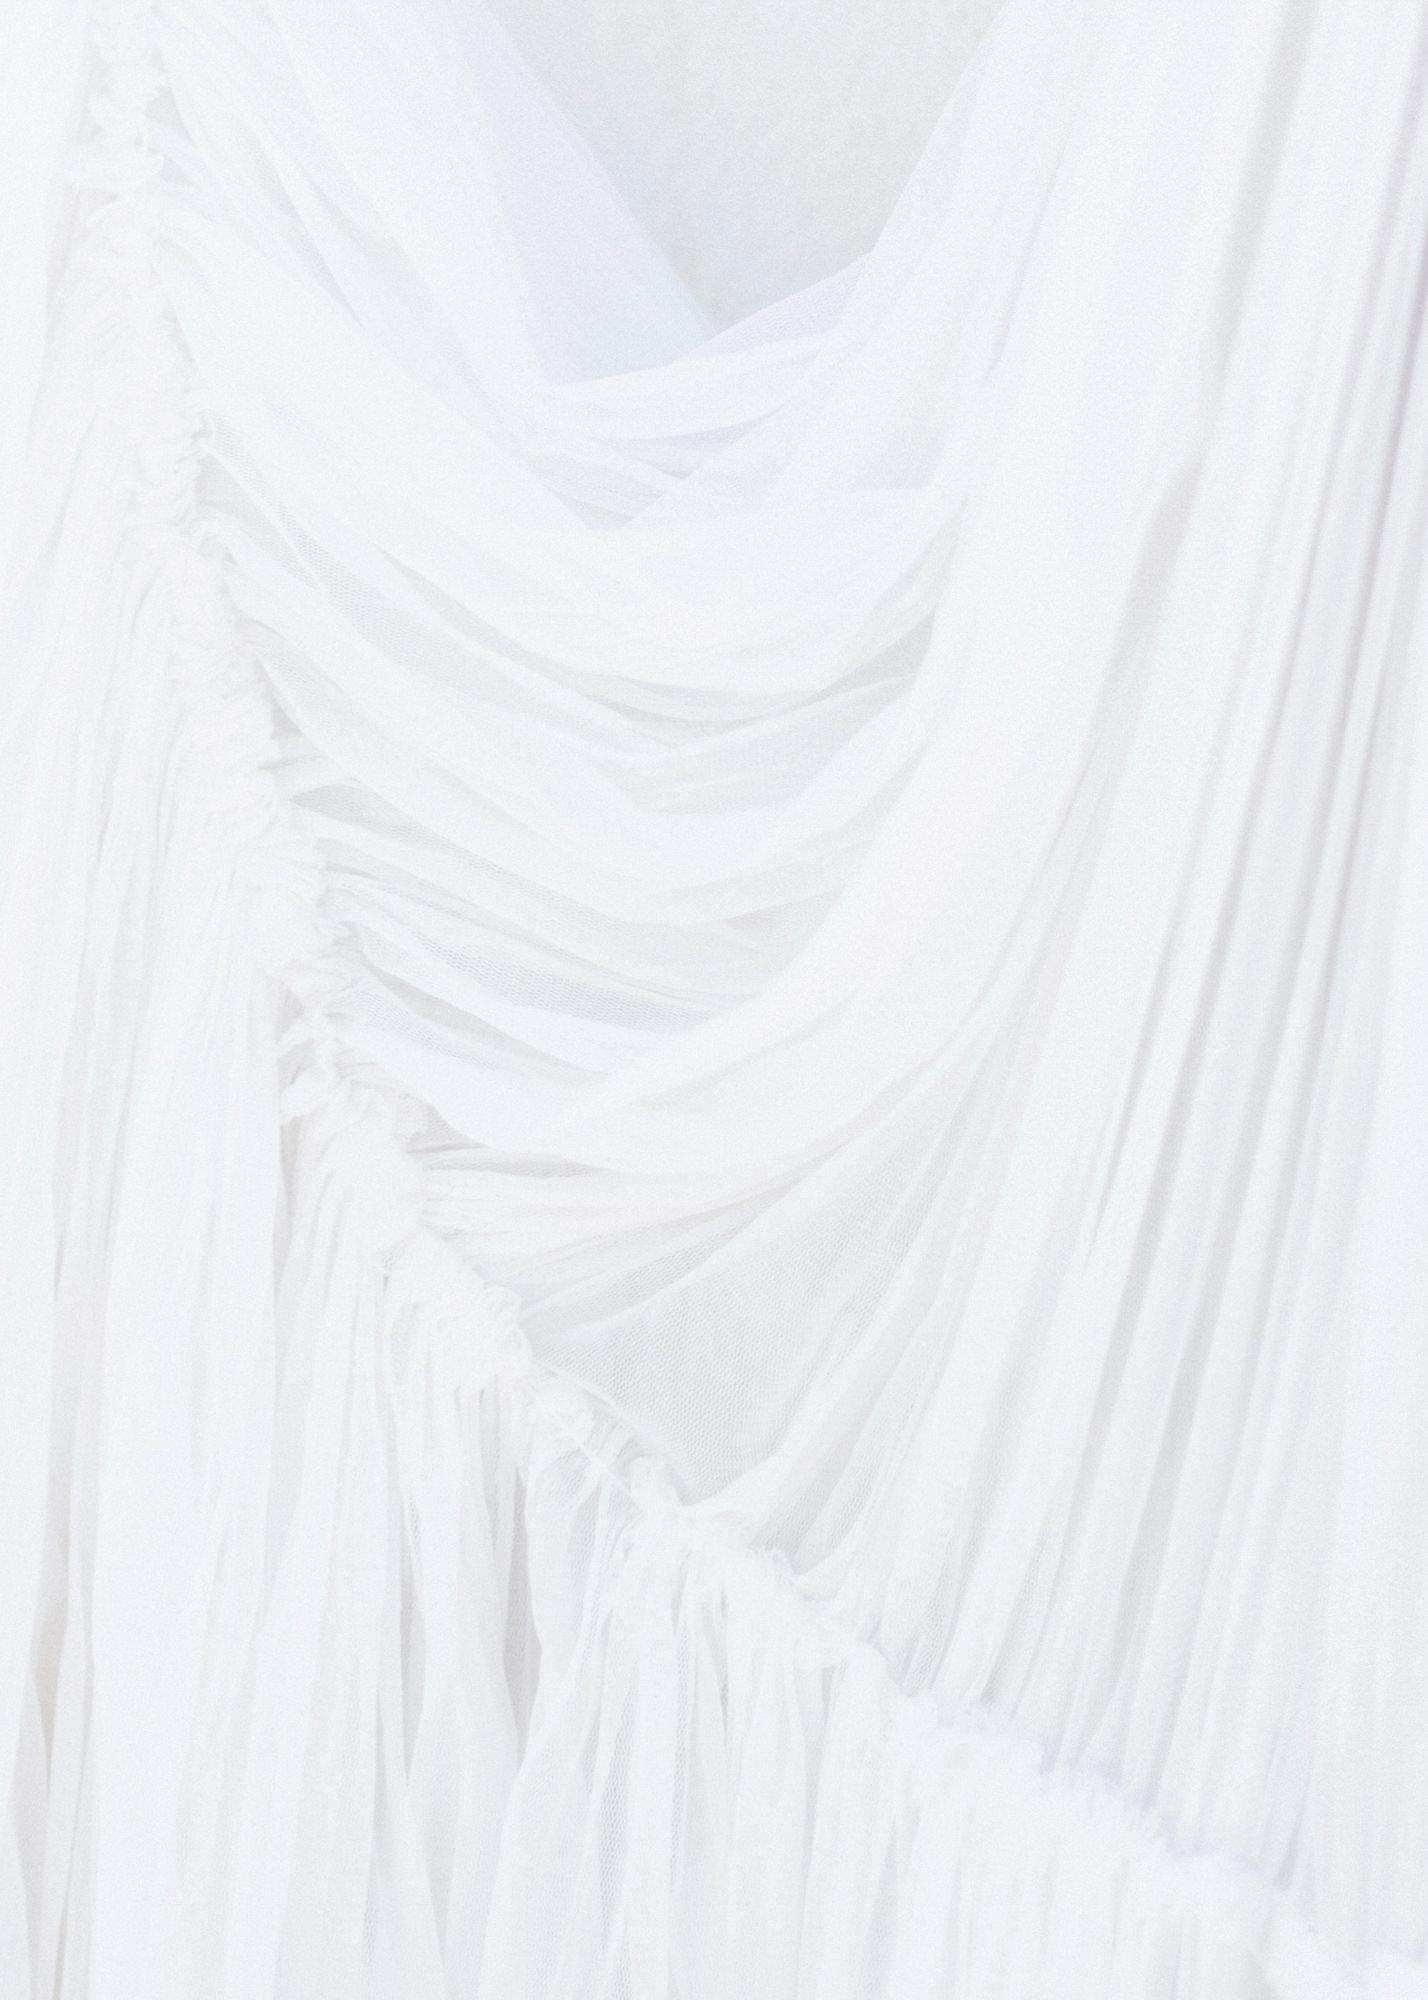 21-portrait-santorini-wedding-photographer-greece-b-v